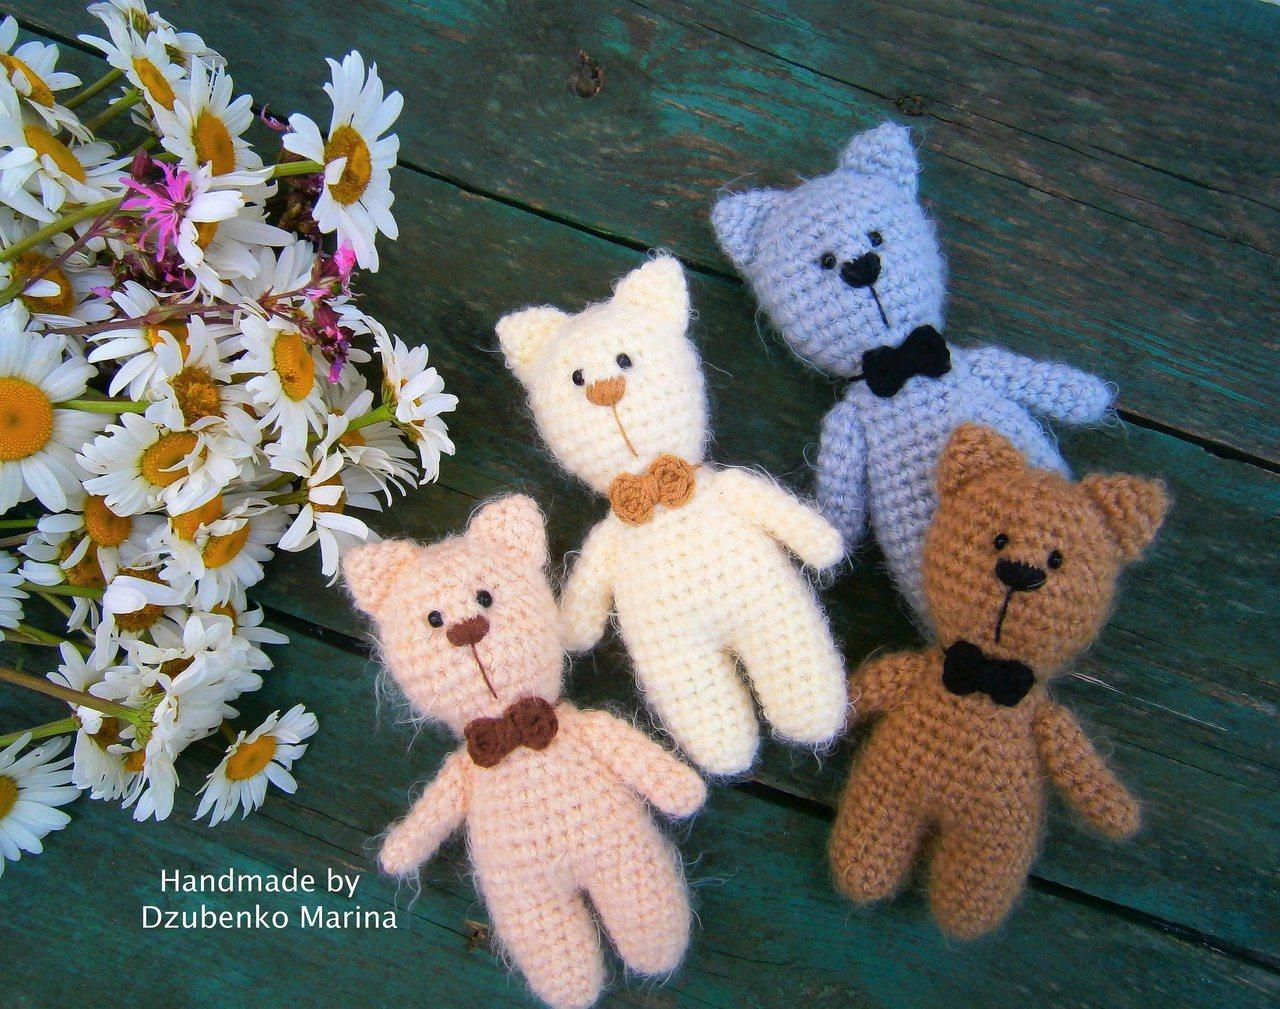 Rosie the little cat amigurumi pattern - Amigurumipatterns.net | 1009x1280